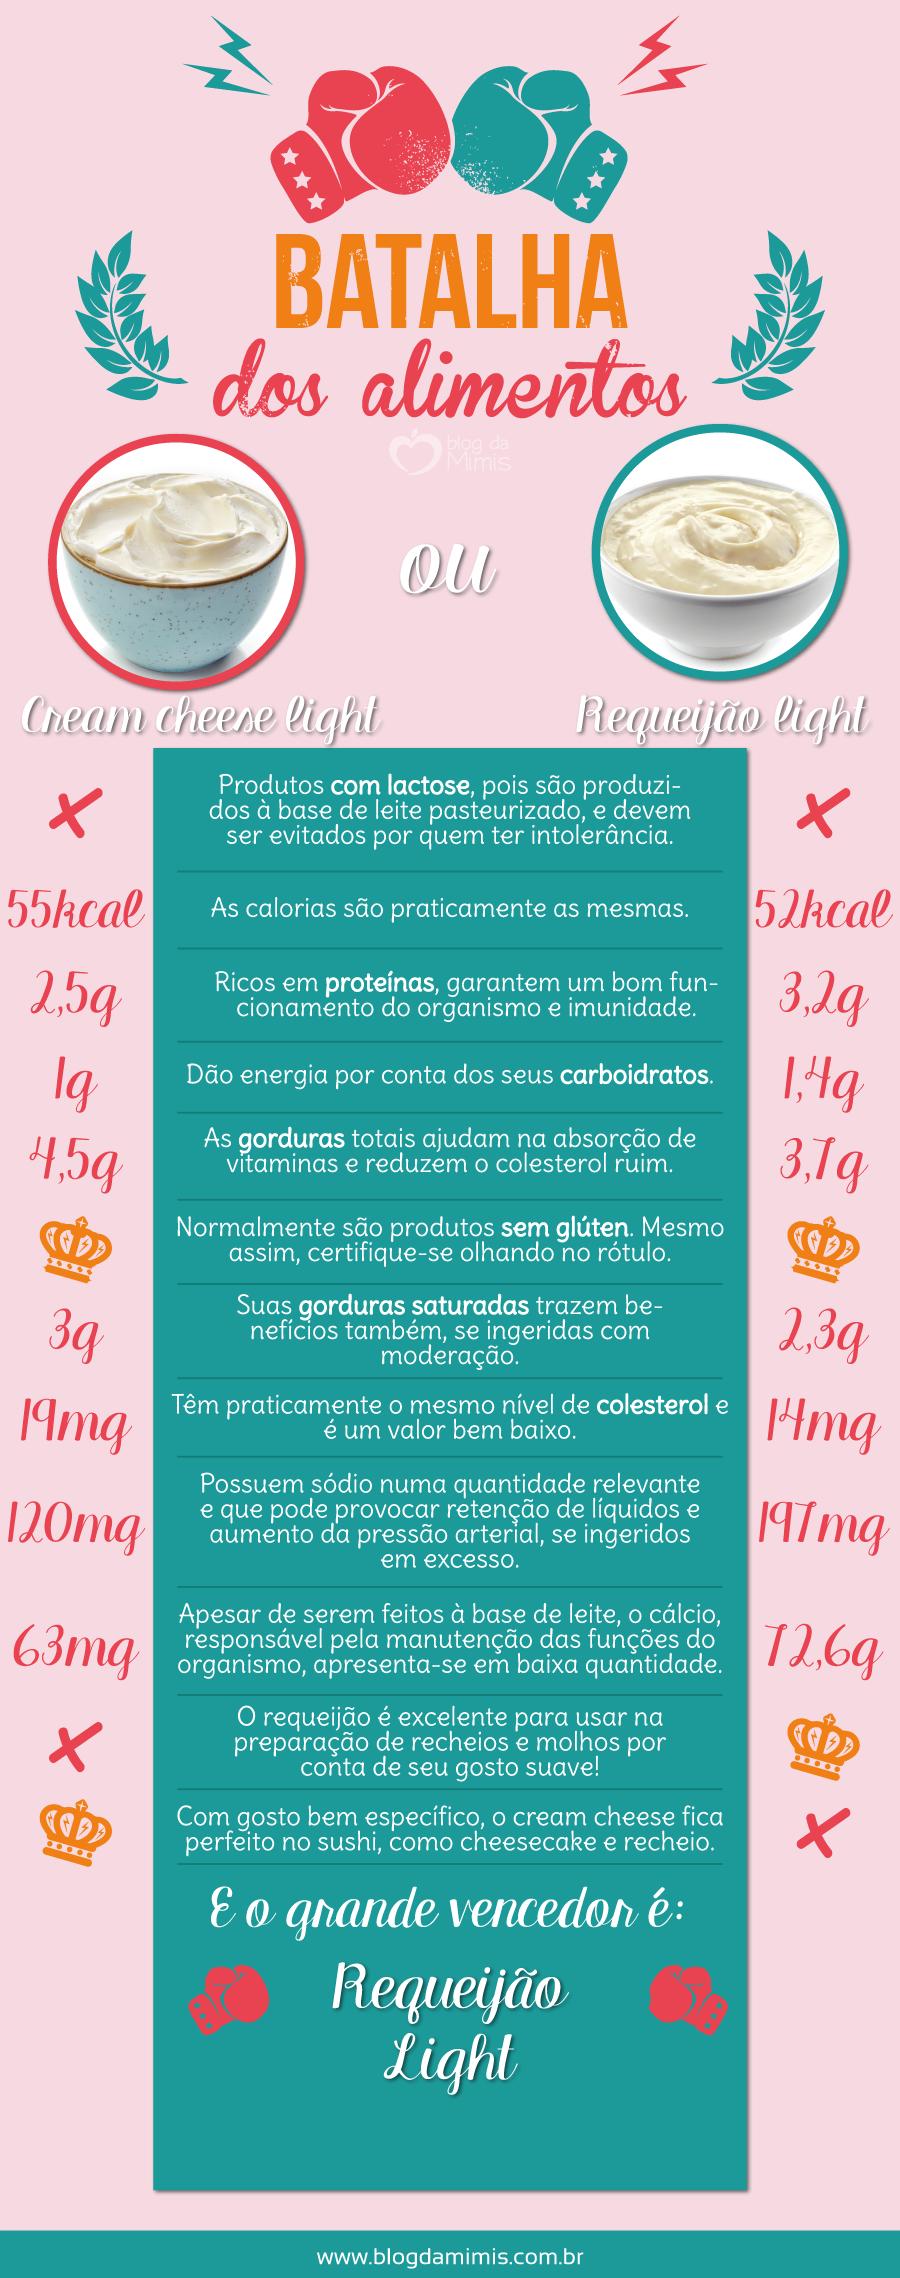 batalha-cream-cheese-vs-requeijao-blog-da-mimis-michelle-franzoni